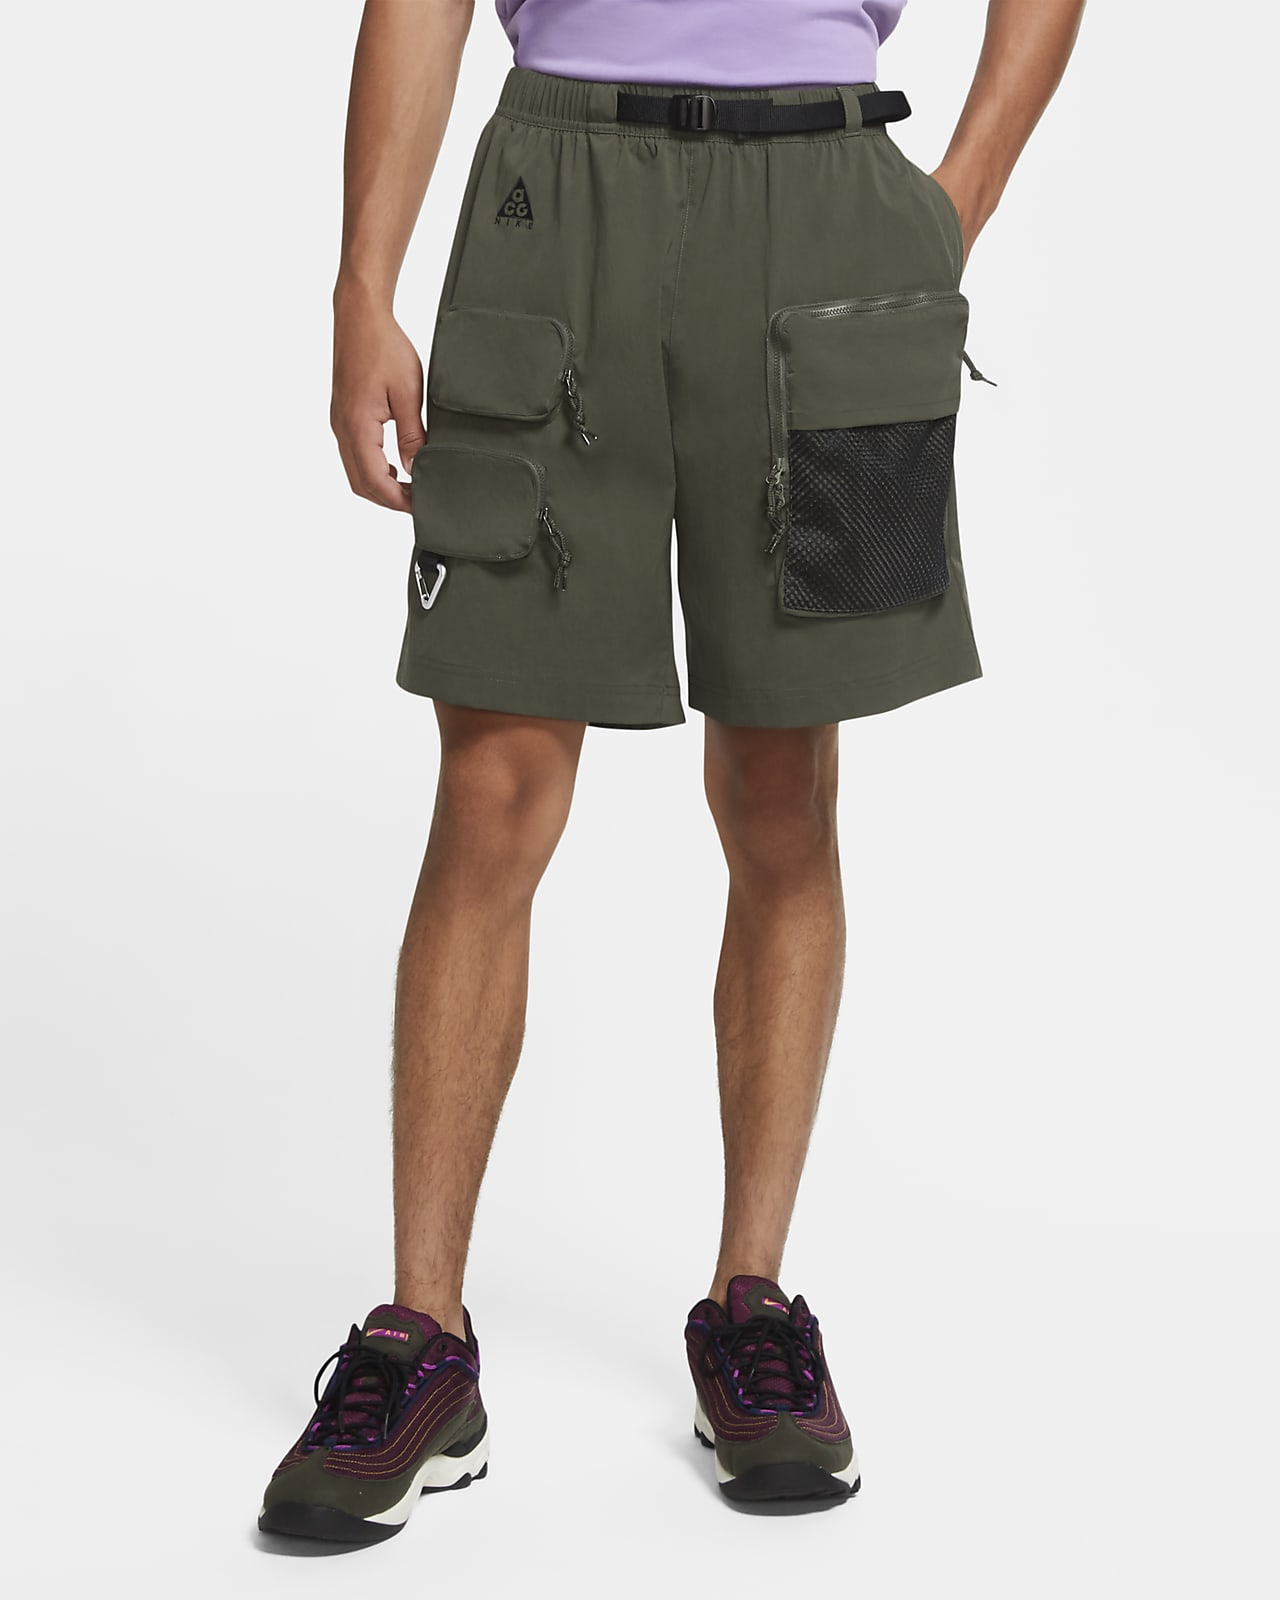 Nike ACG Men's Cargo Shorts